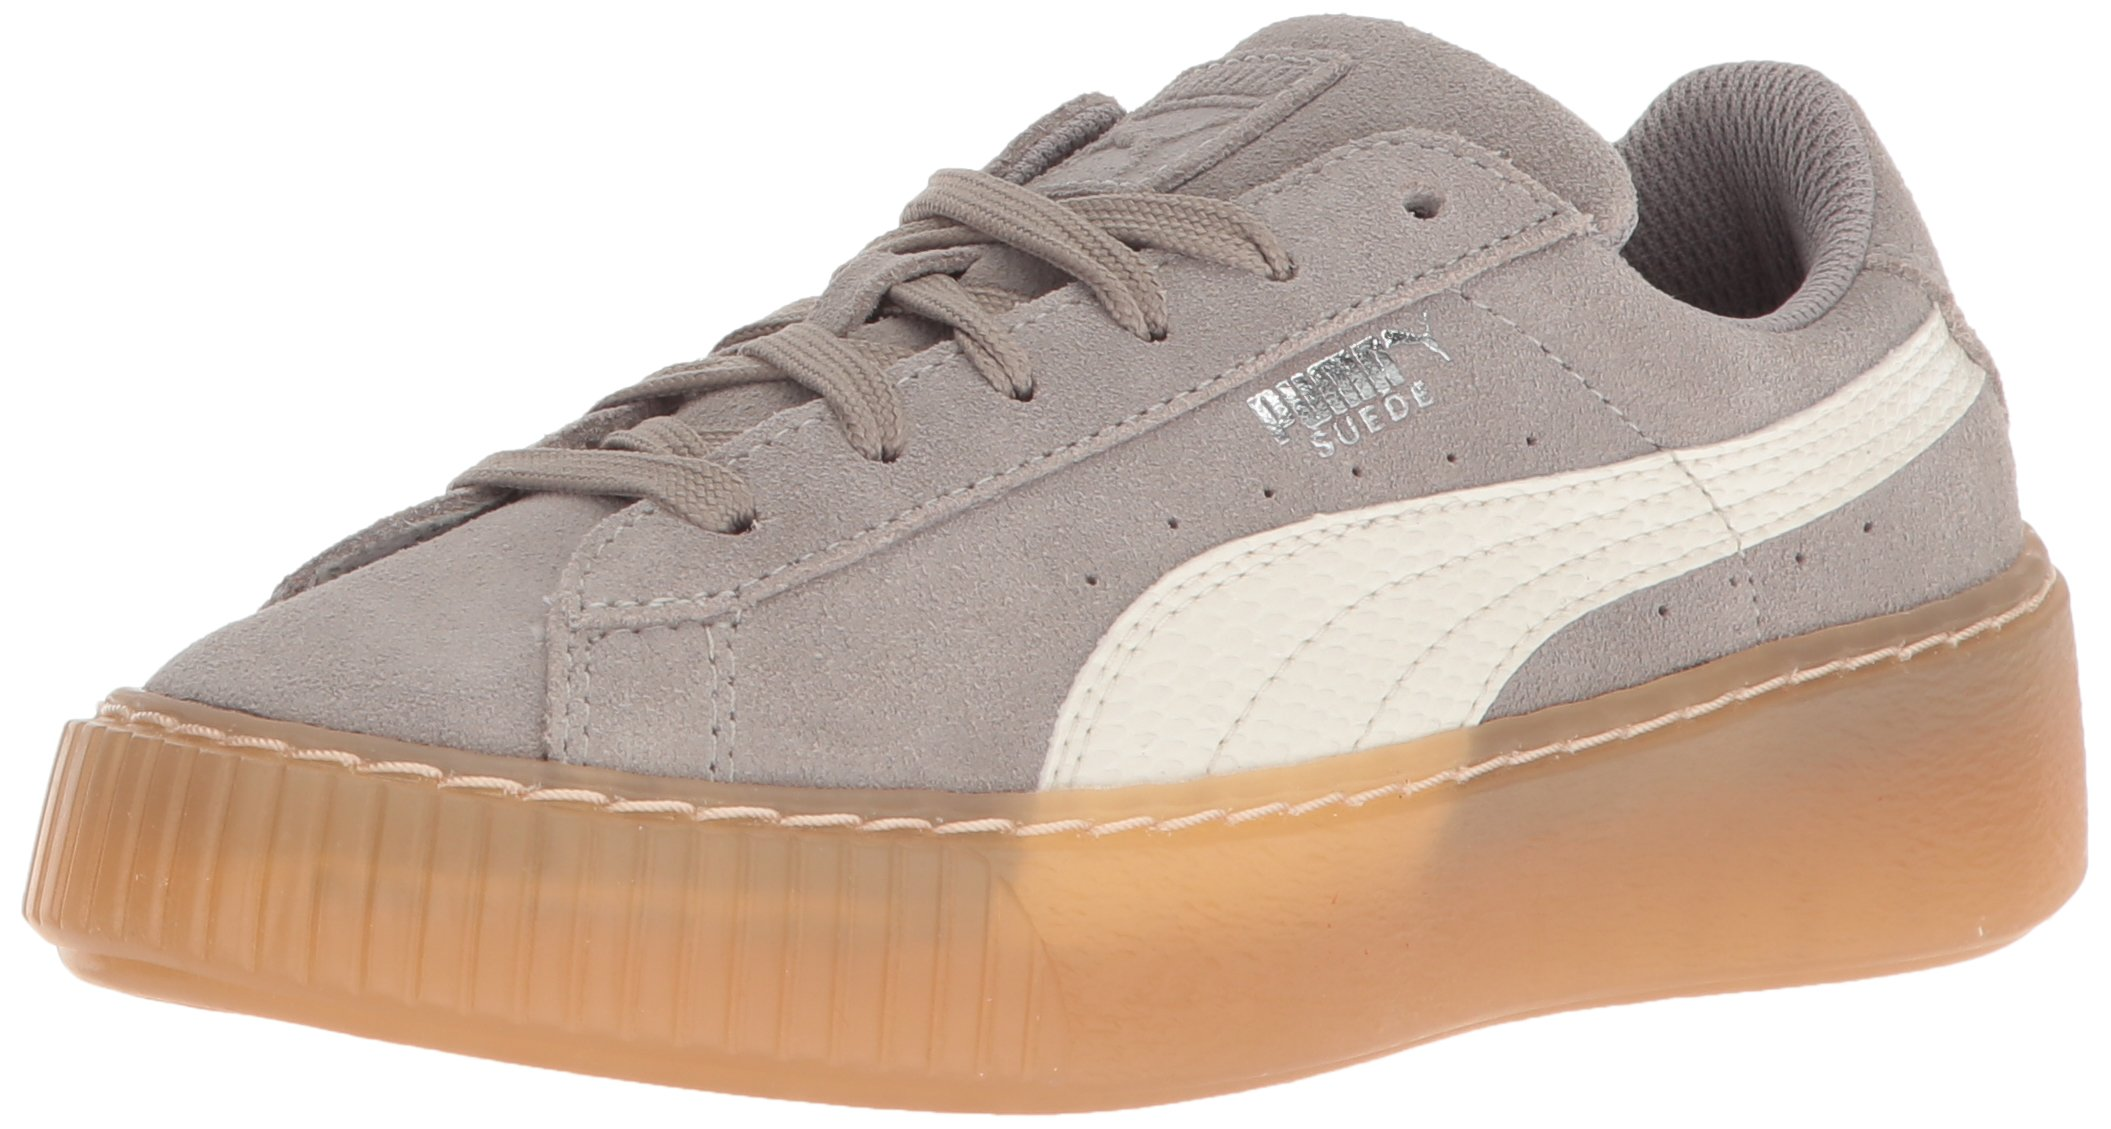 PUMA Unisex Suede Platform SNK Kids Sneaker, Rock Ridge-Whisper White, 12 M US Little